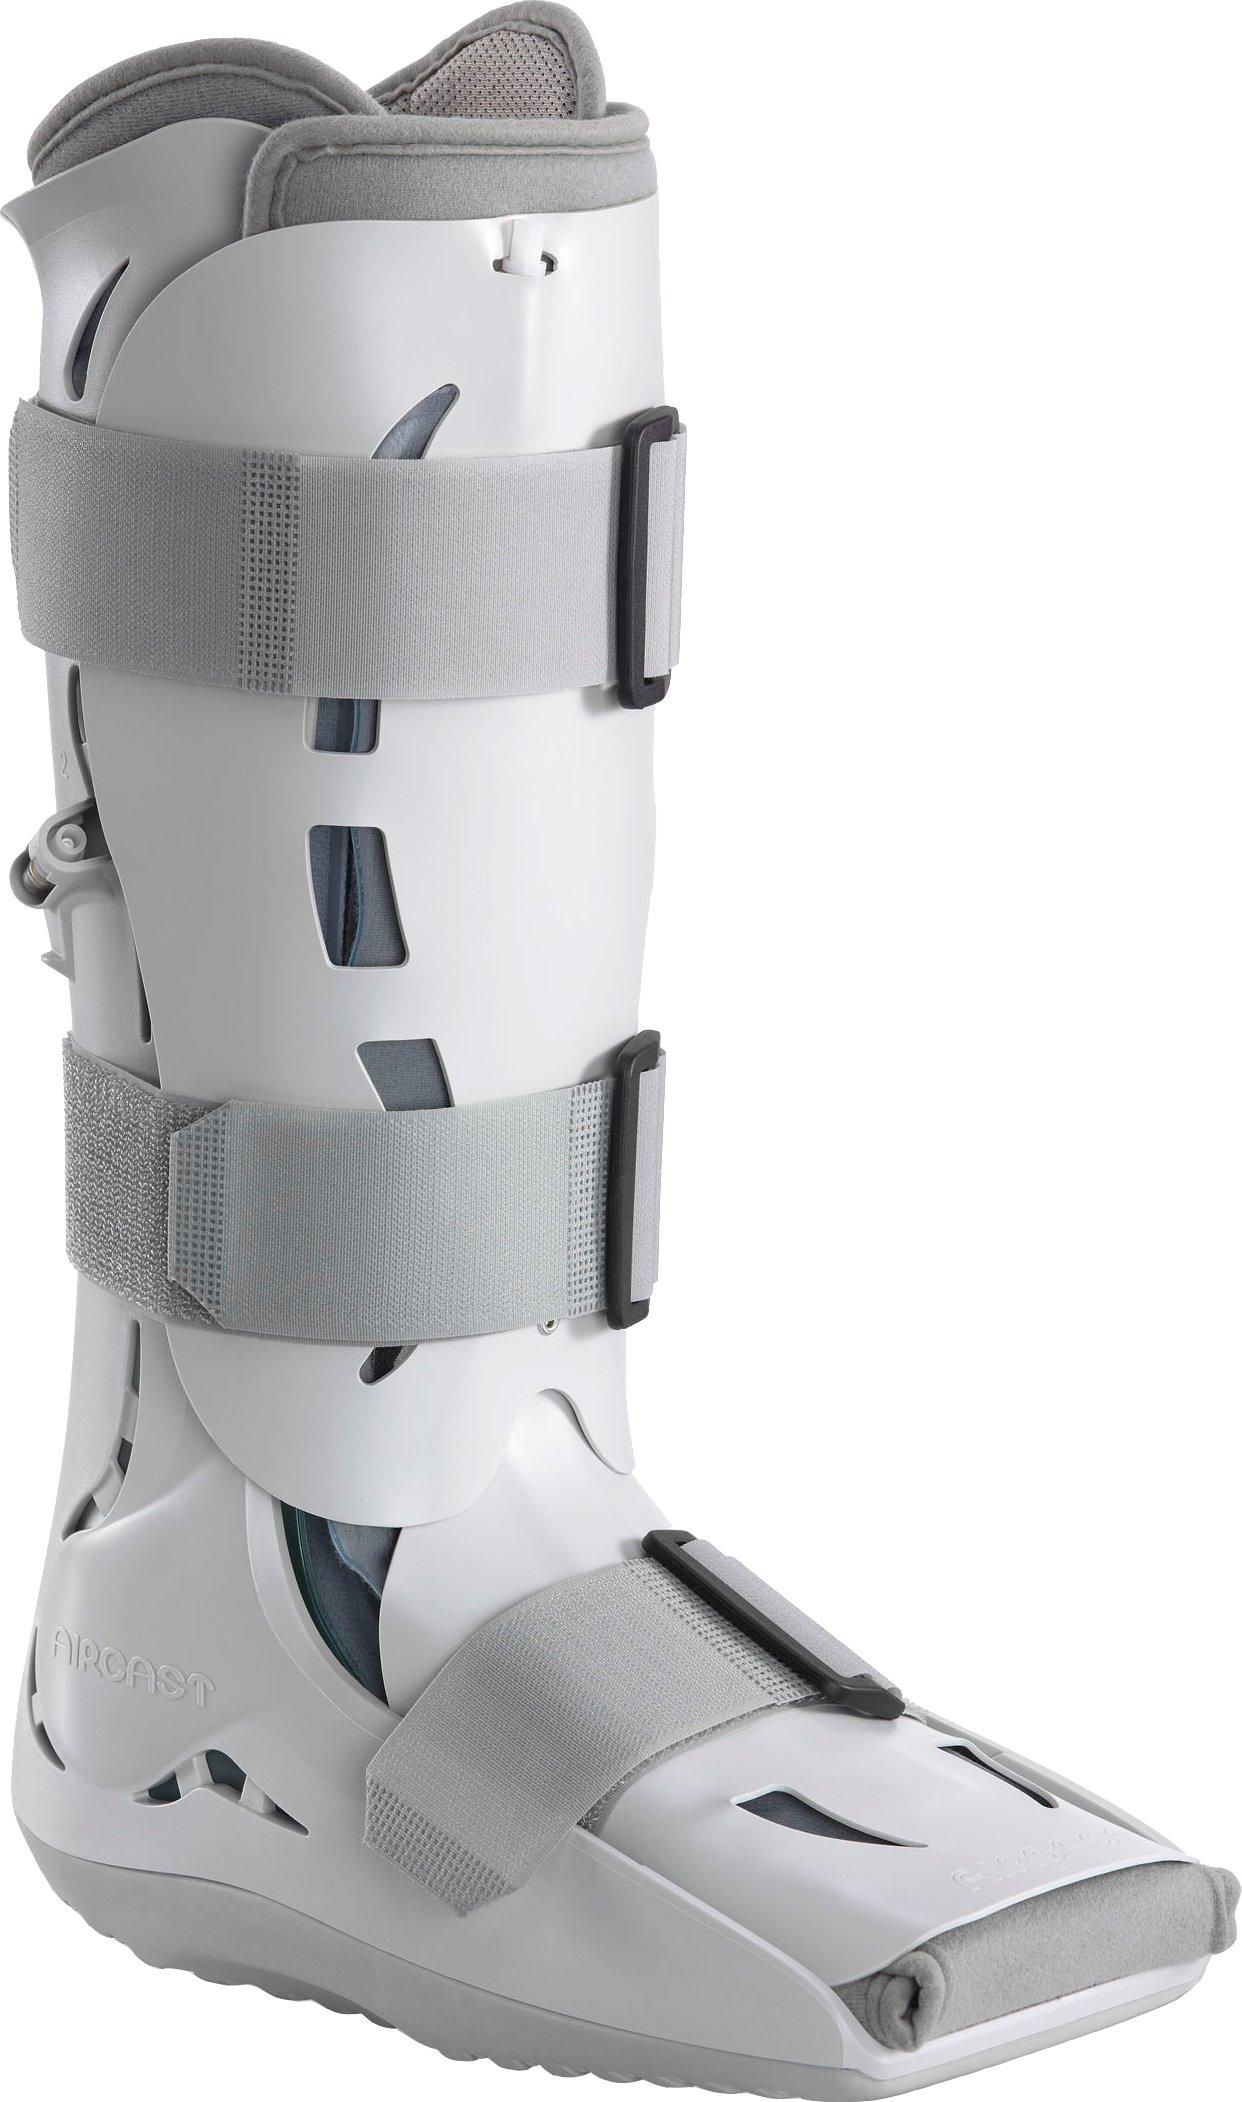 Aircast XP (Extra Pneumatic) Walker Brace / Walking Boot, Large